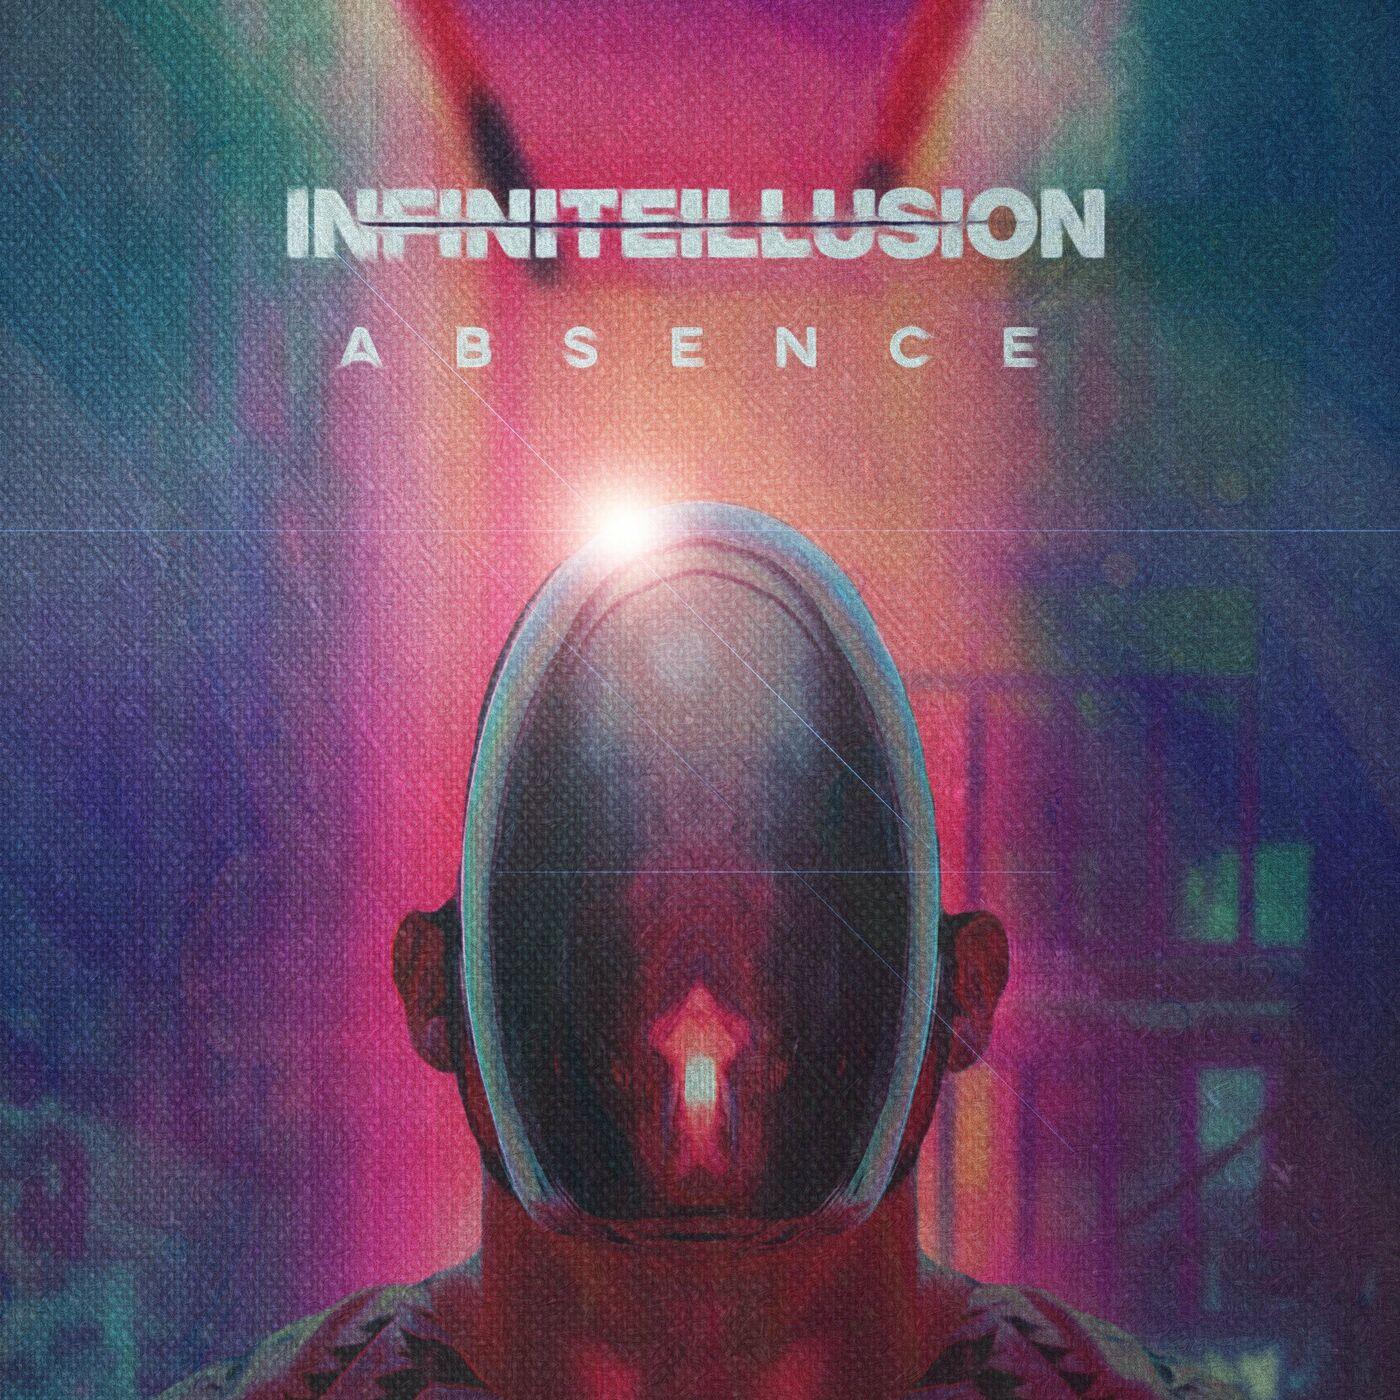 Infinite Illusion - Absence [single] (2020)